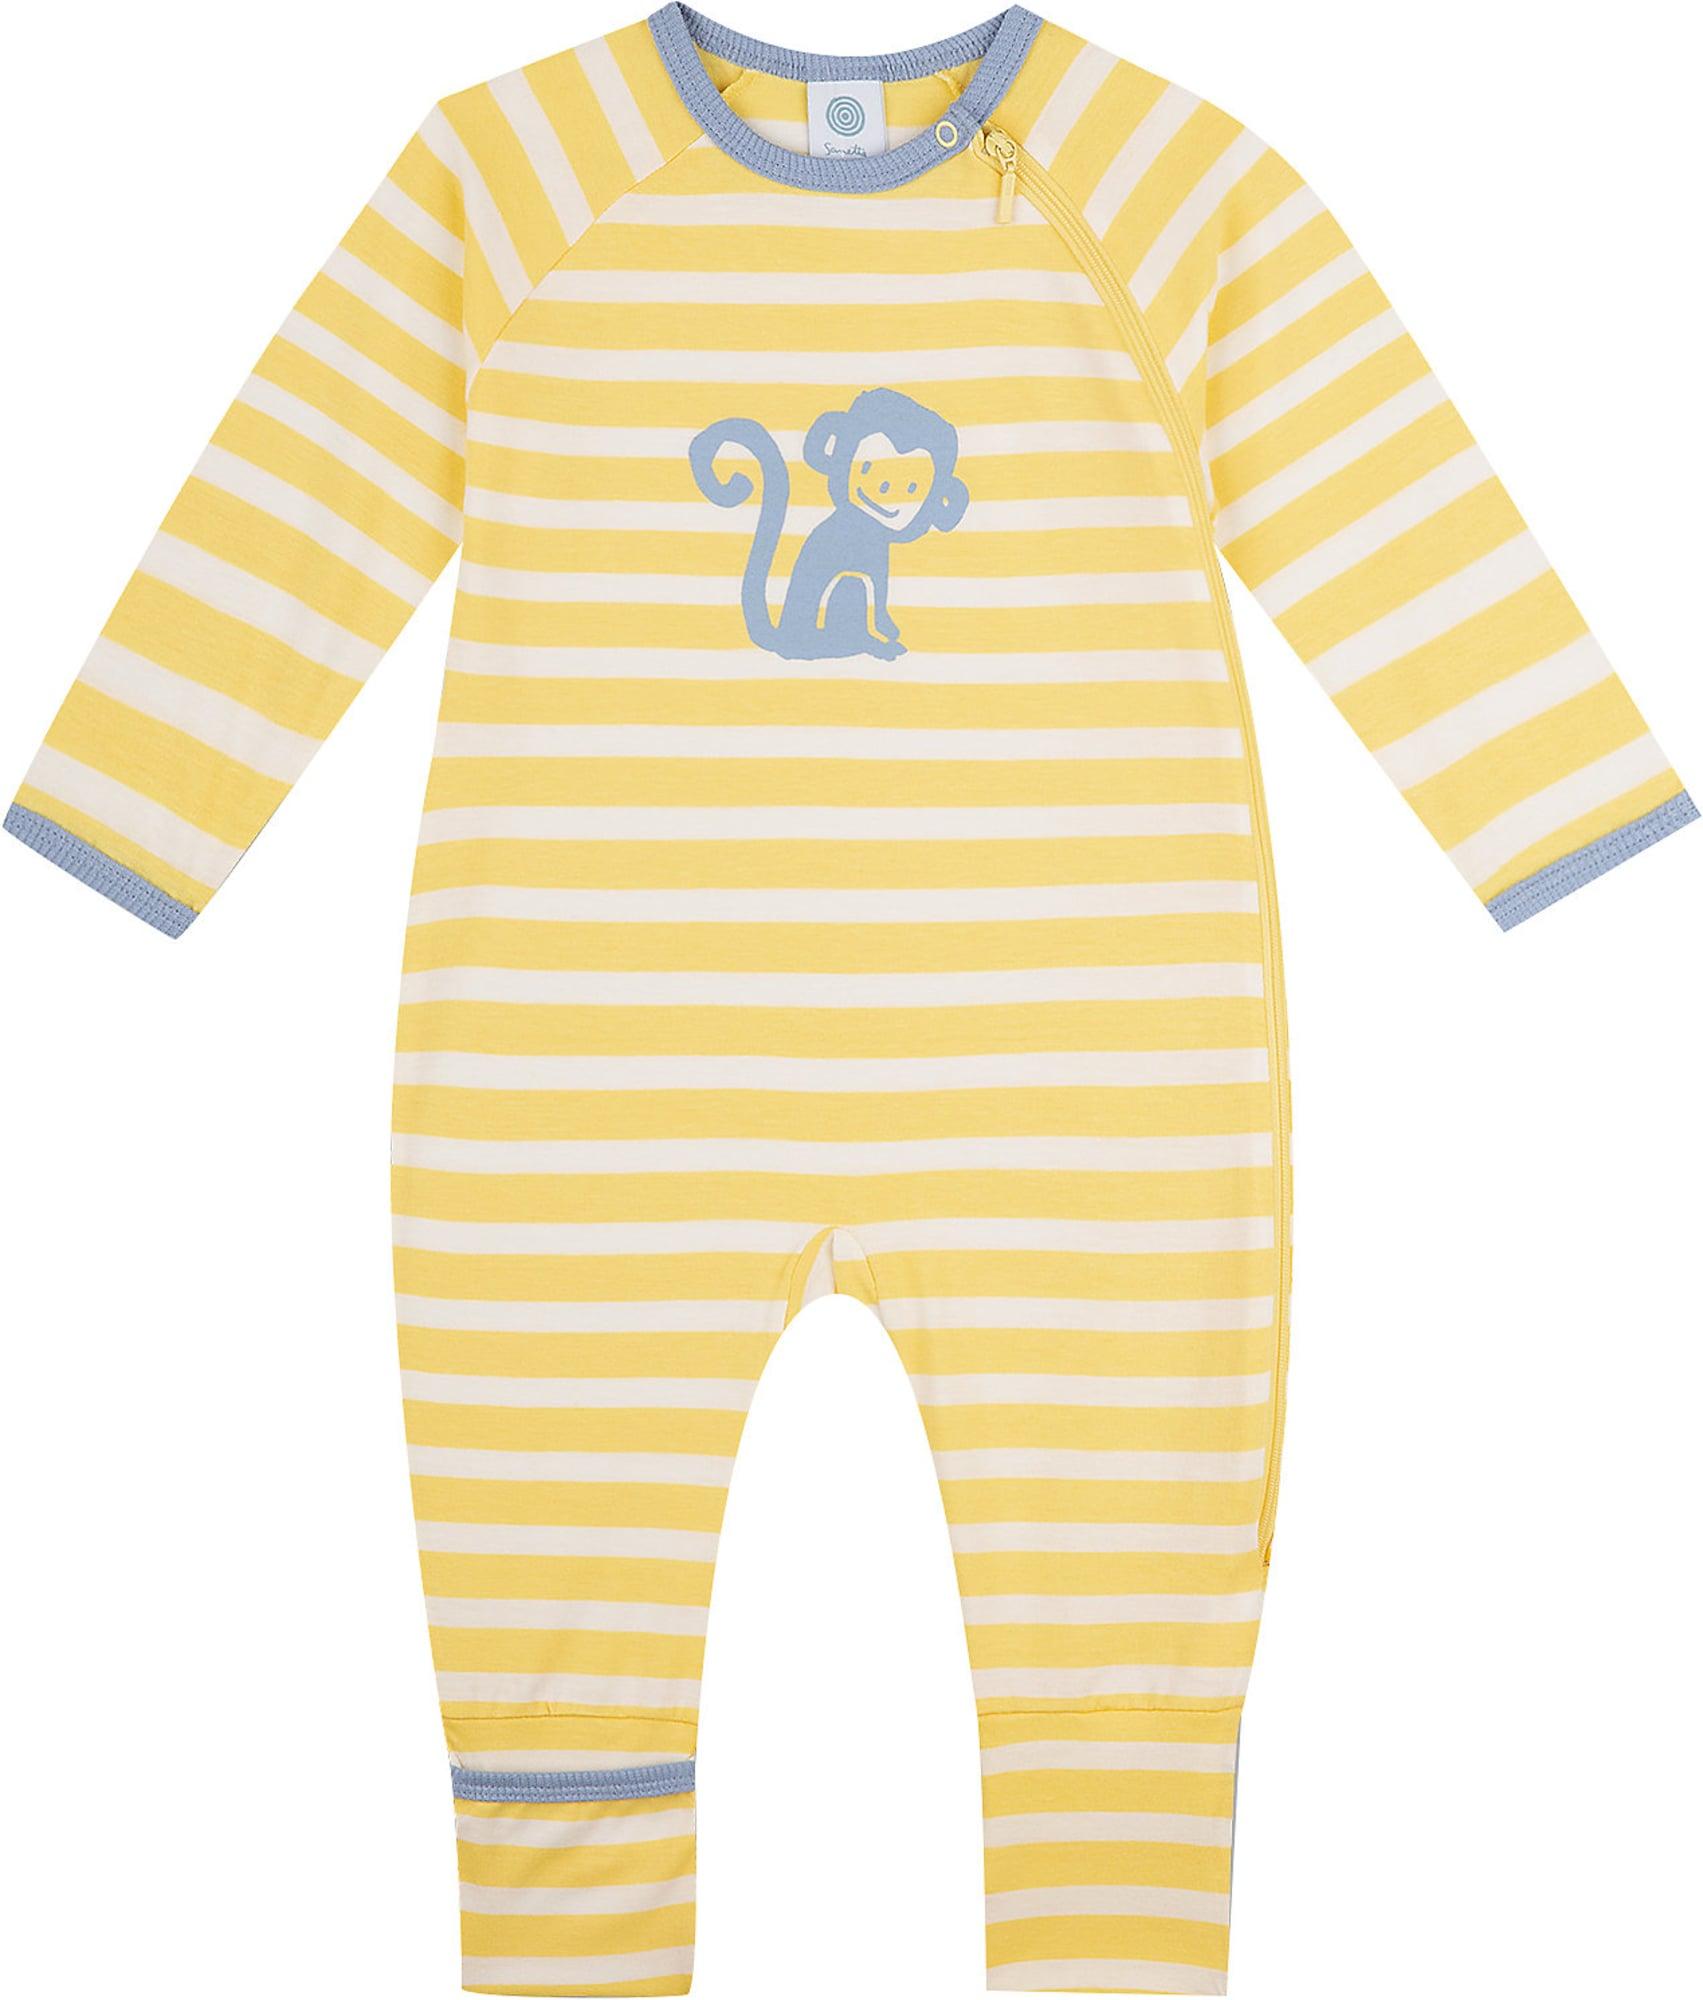 SANETTA Miego kostiumas geltona / balta / melsvai pilka